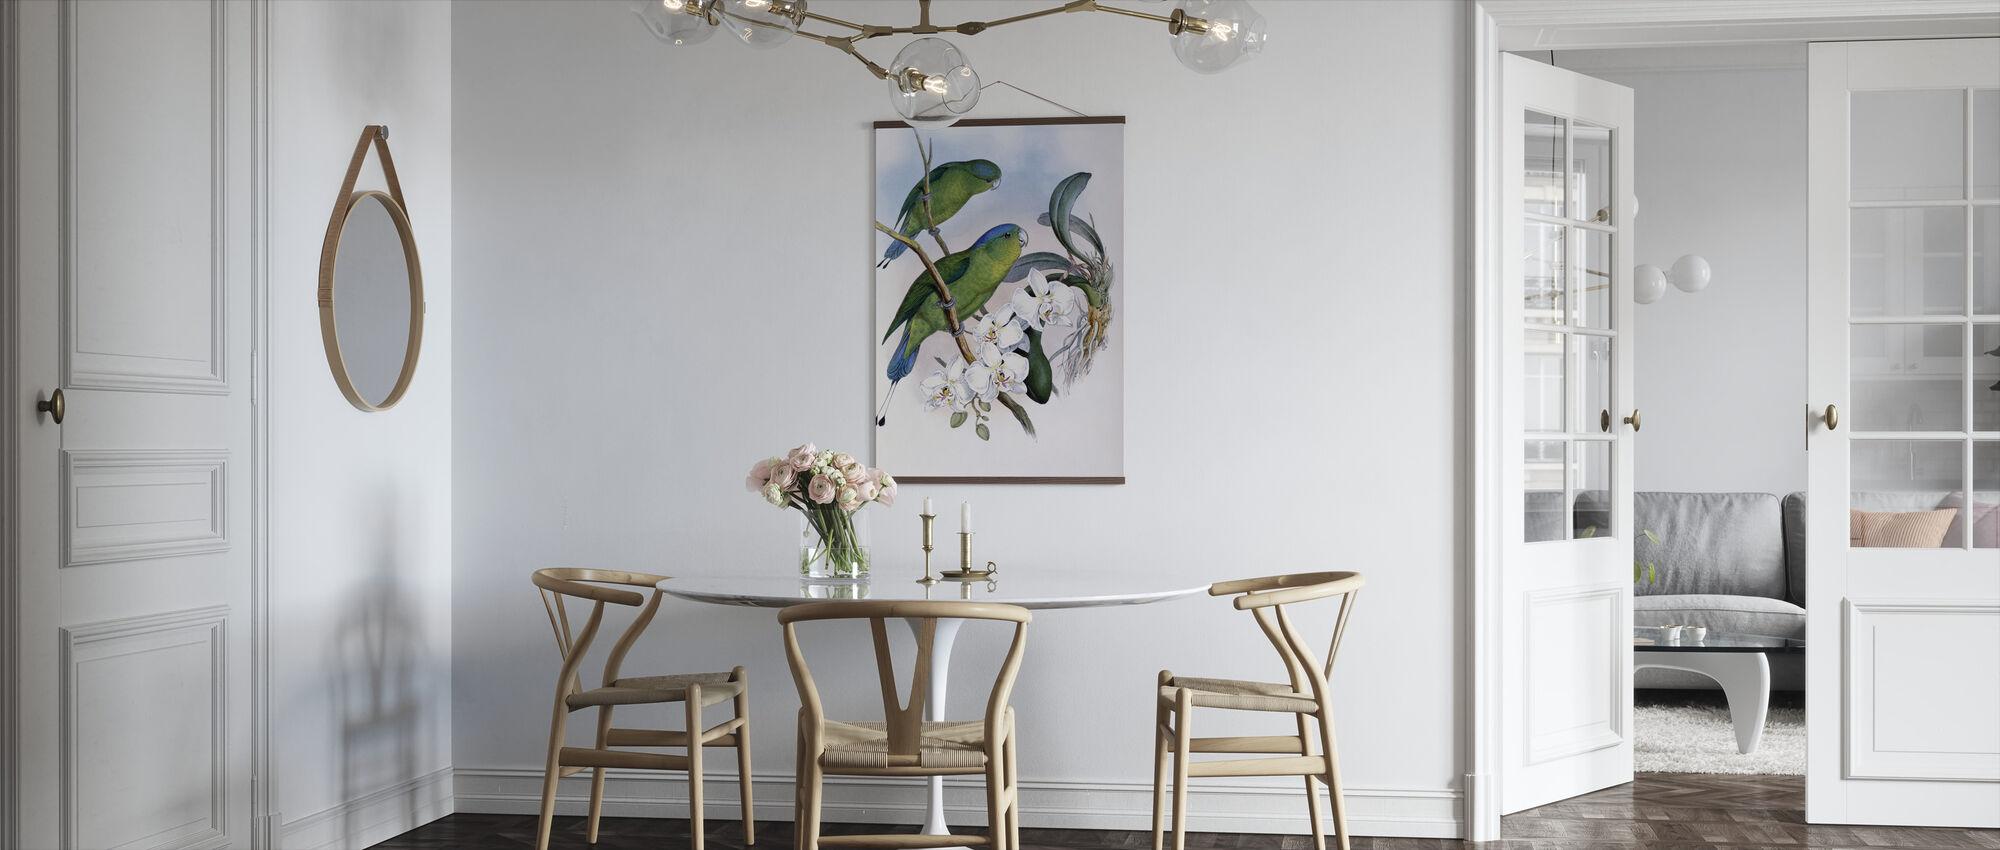 Filippinska Racket-Tailed papegoja - John Gould - Poster - Kök